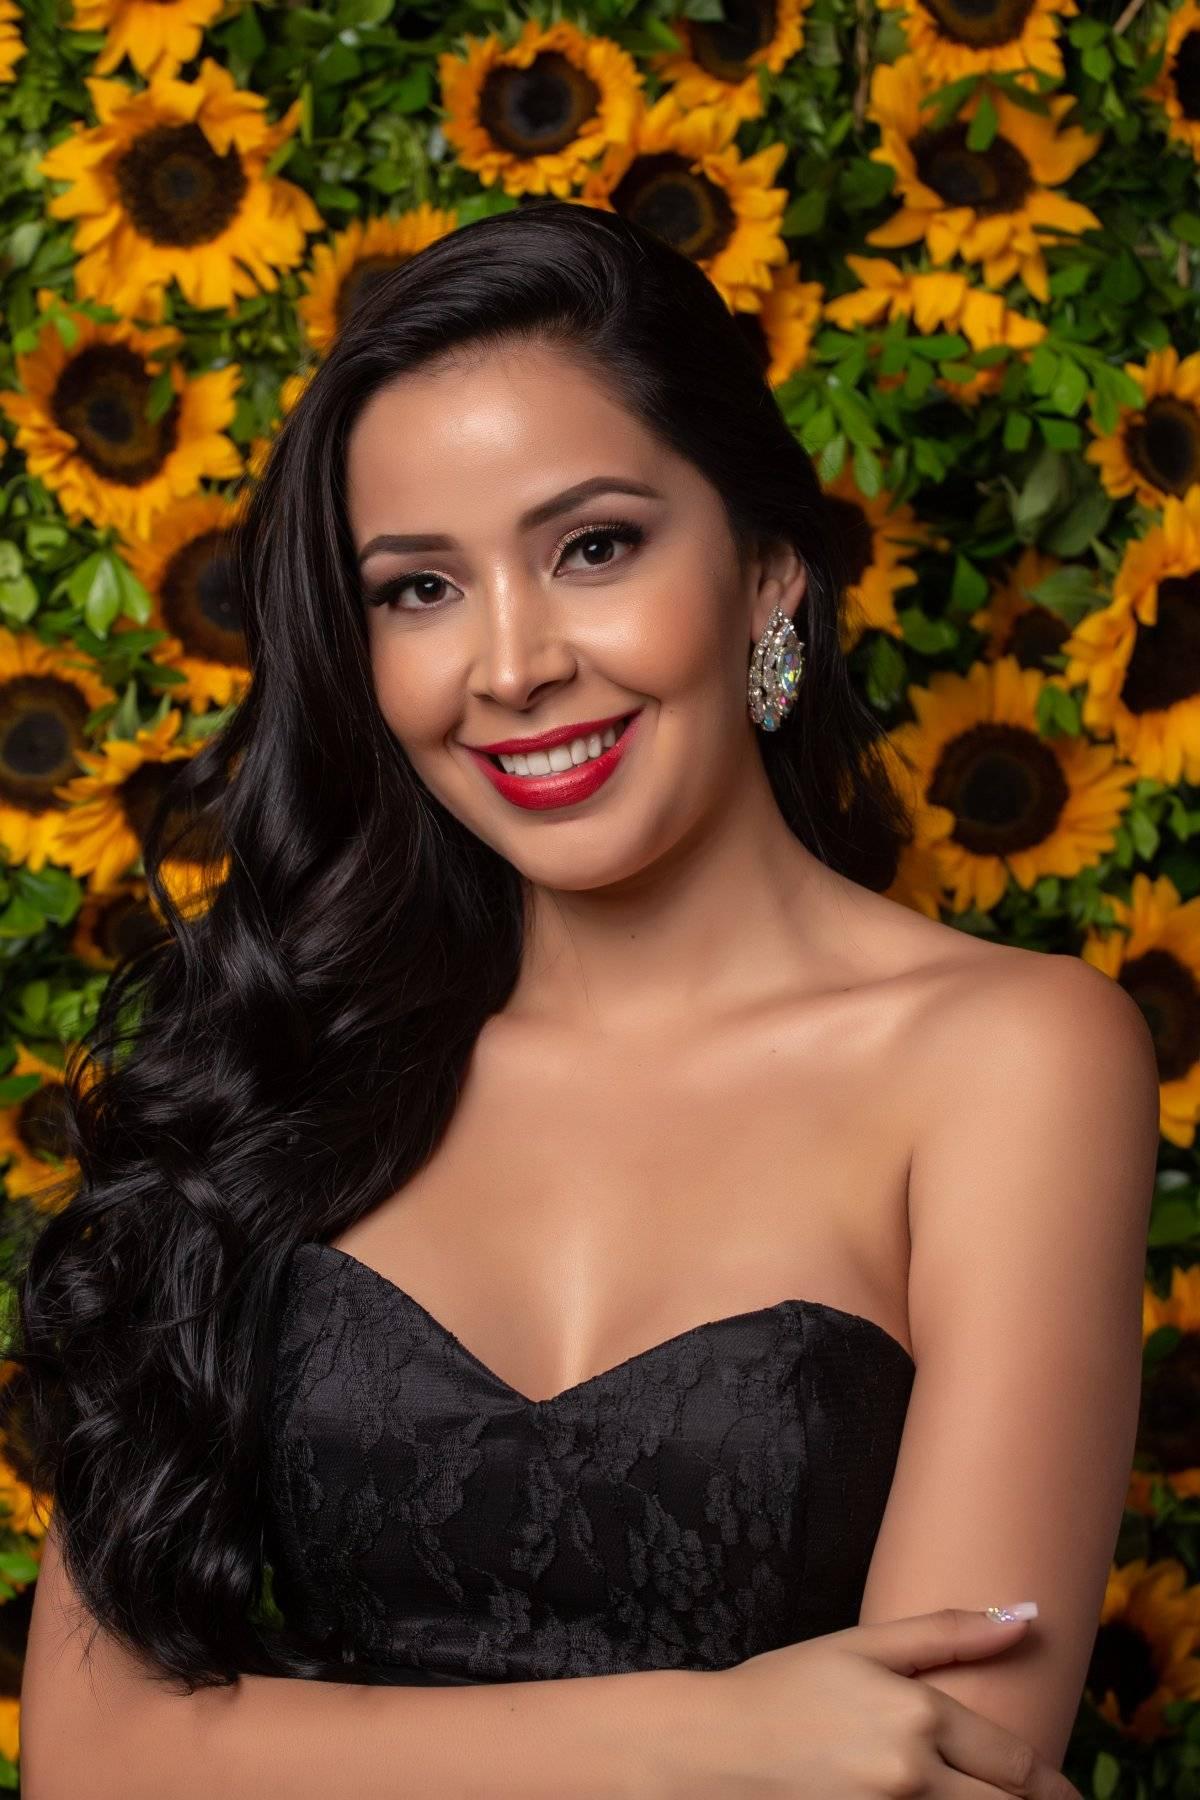 CANDIDATAS A MISS ECUADOR 2019.  FINAL 19 DE JULIO 8vielkacanartemanta-21dcd98e1ab16e74d7acd17819268d5f-1200x0